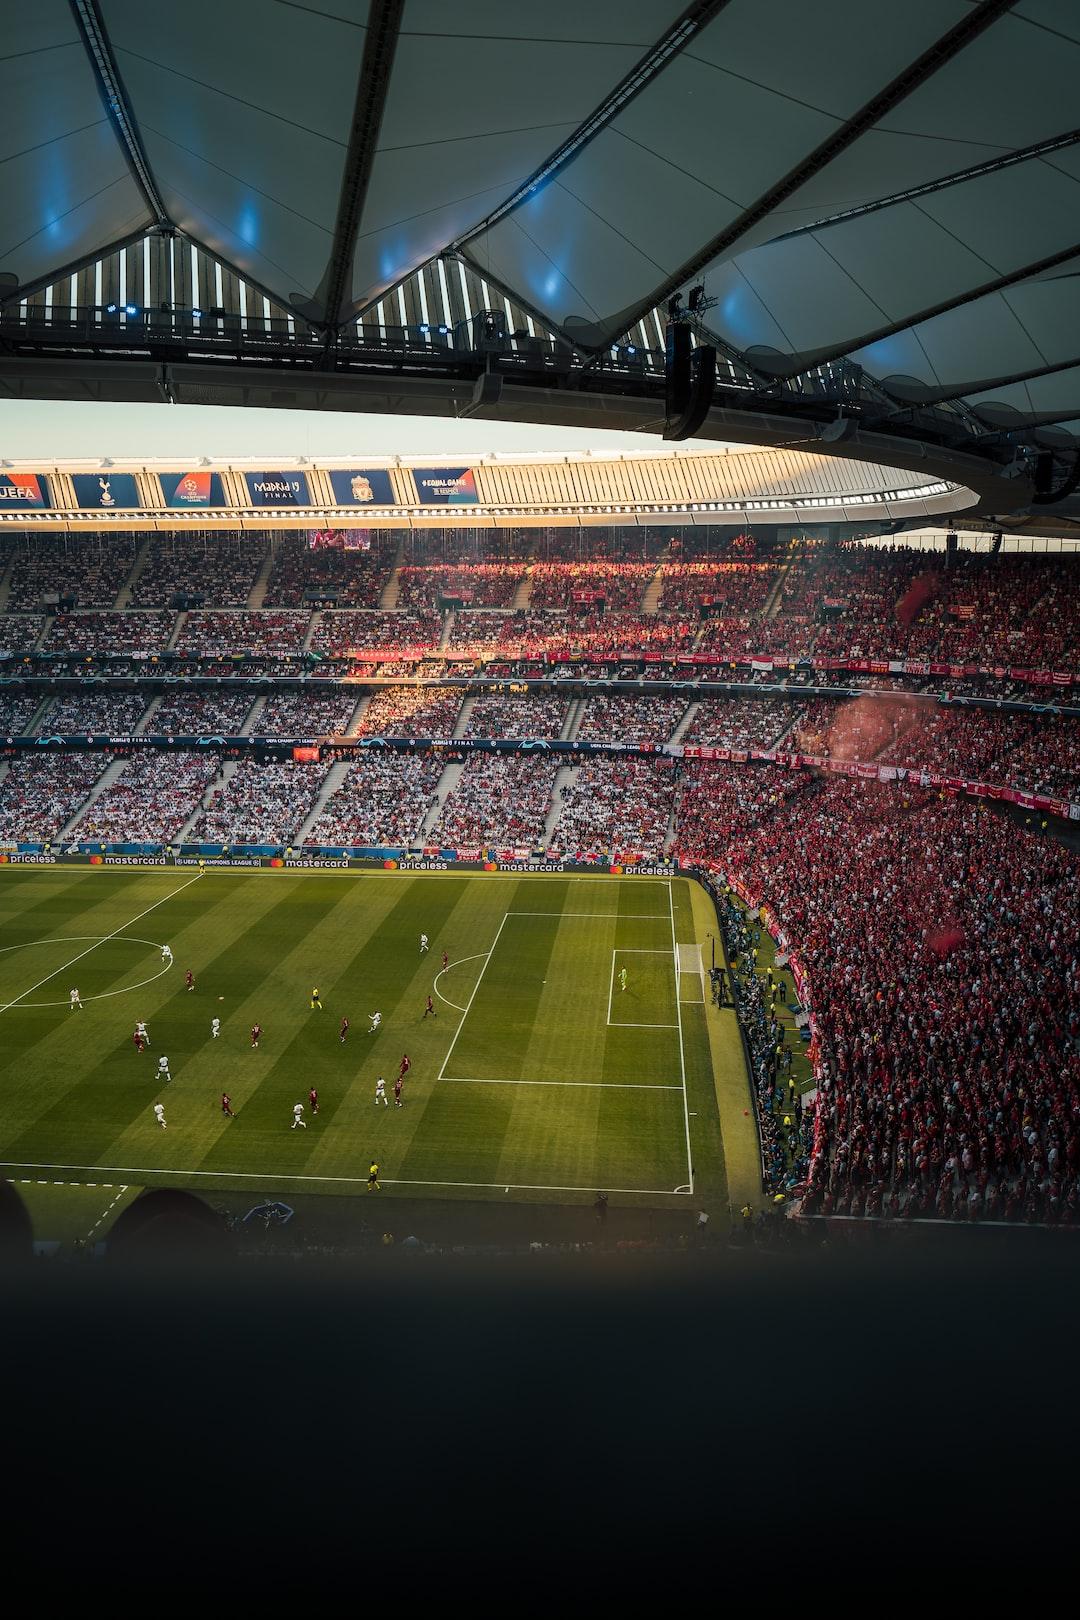 Champions League final at the Wanda Metropolitano in Madrid